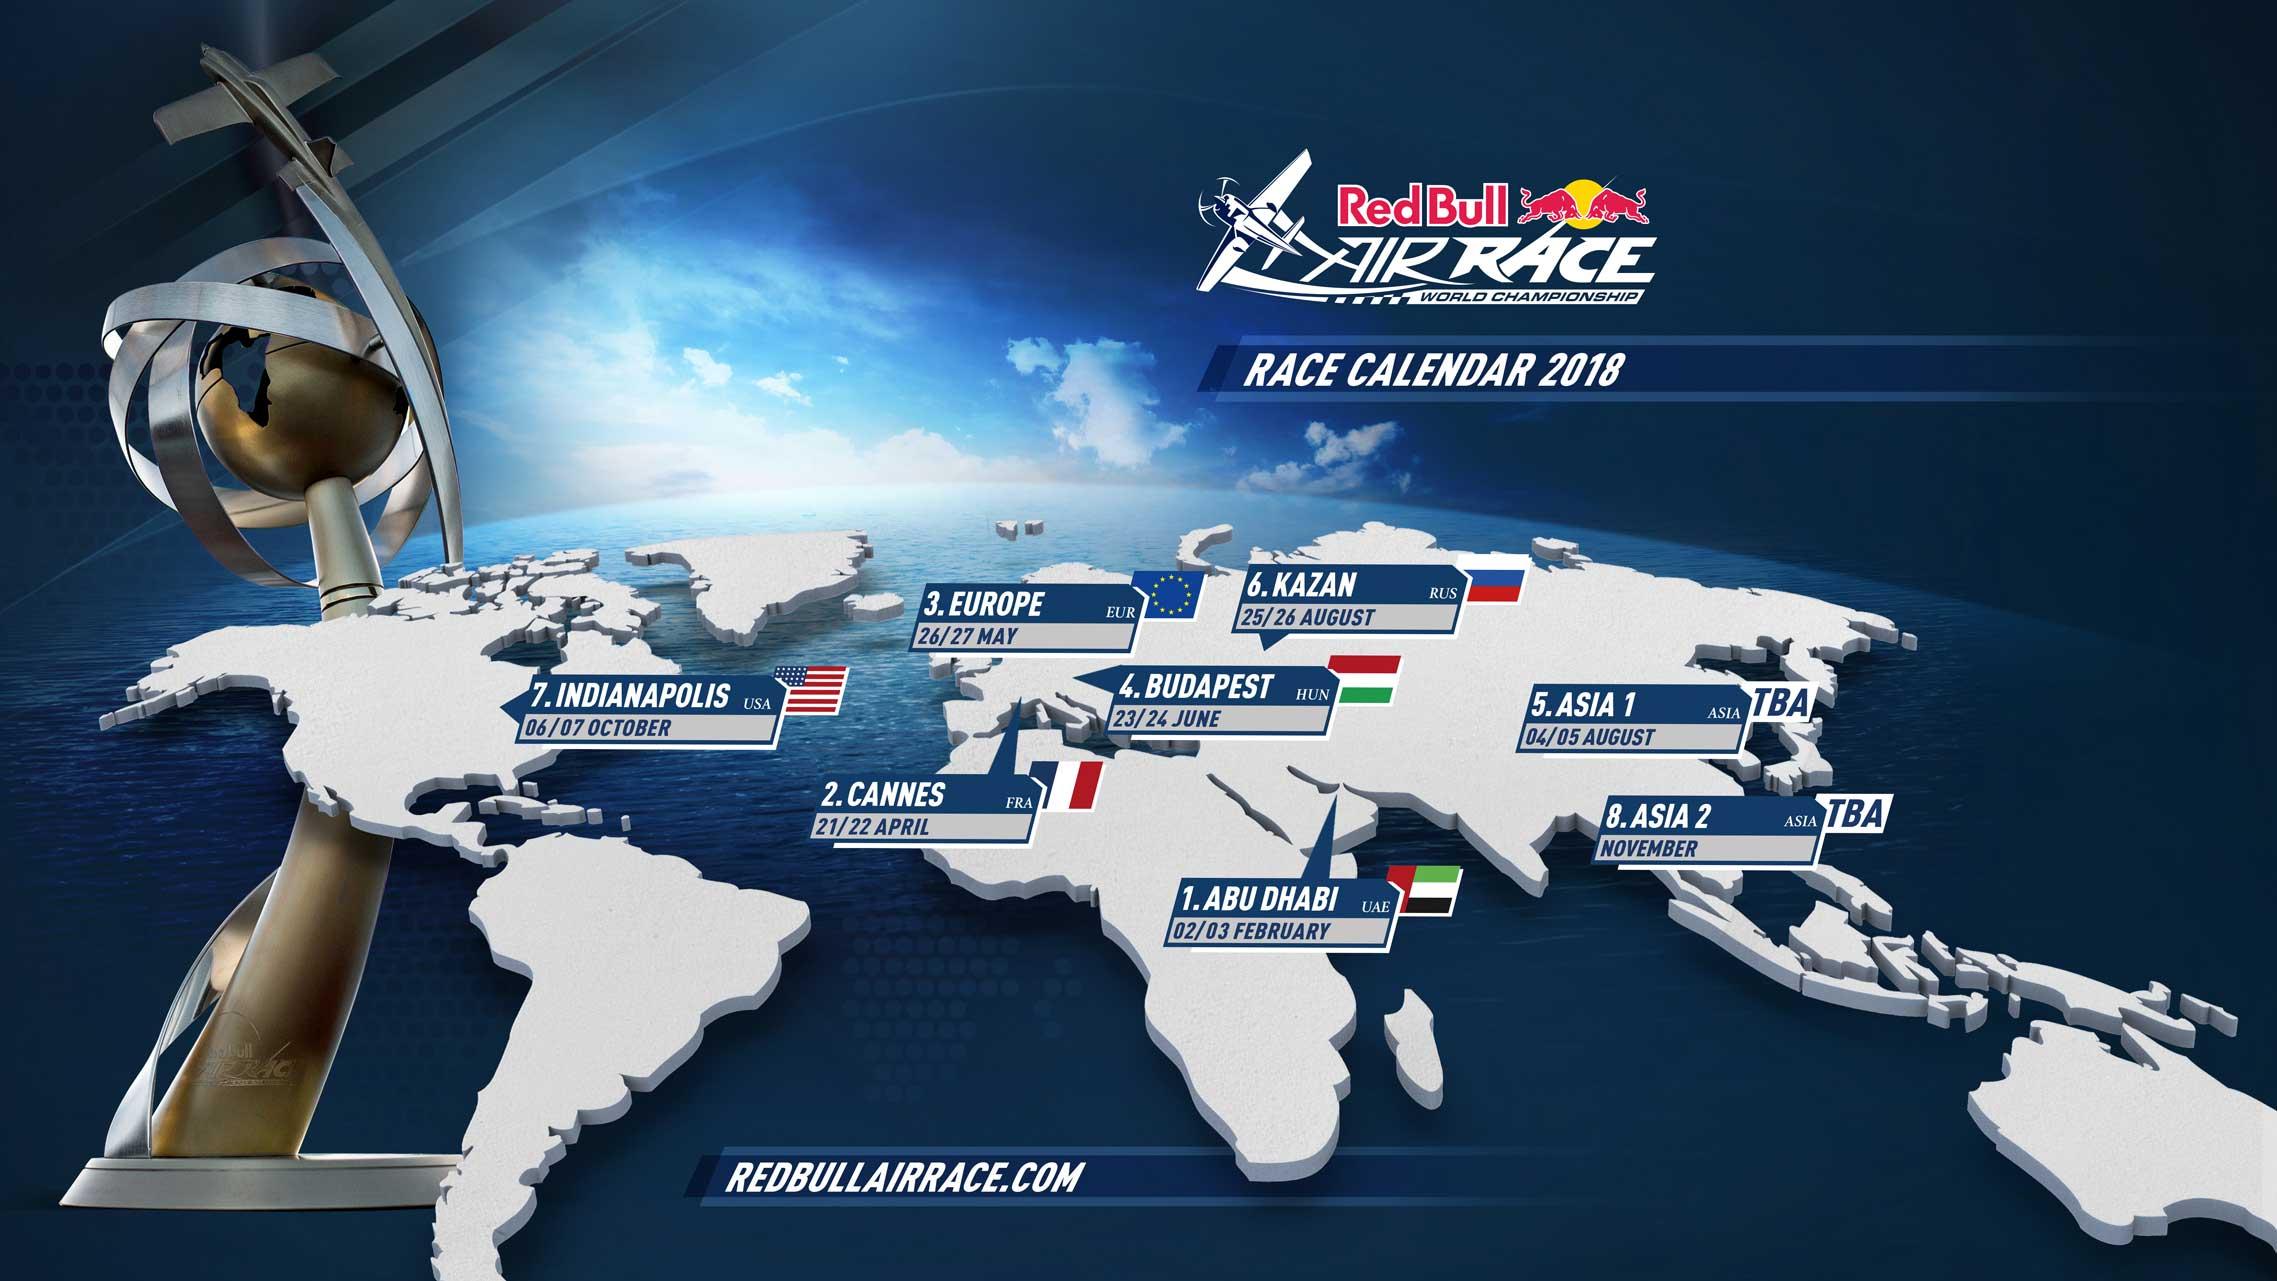 Red Bull Air Race 2018 calendar